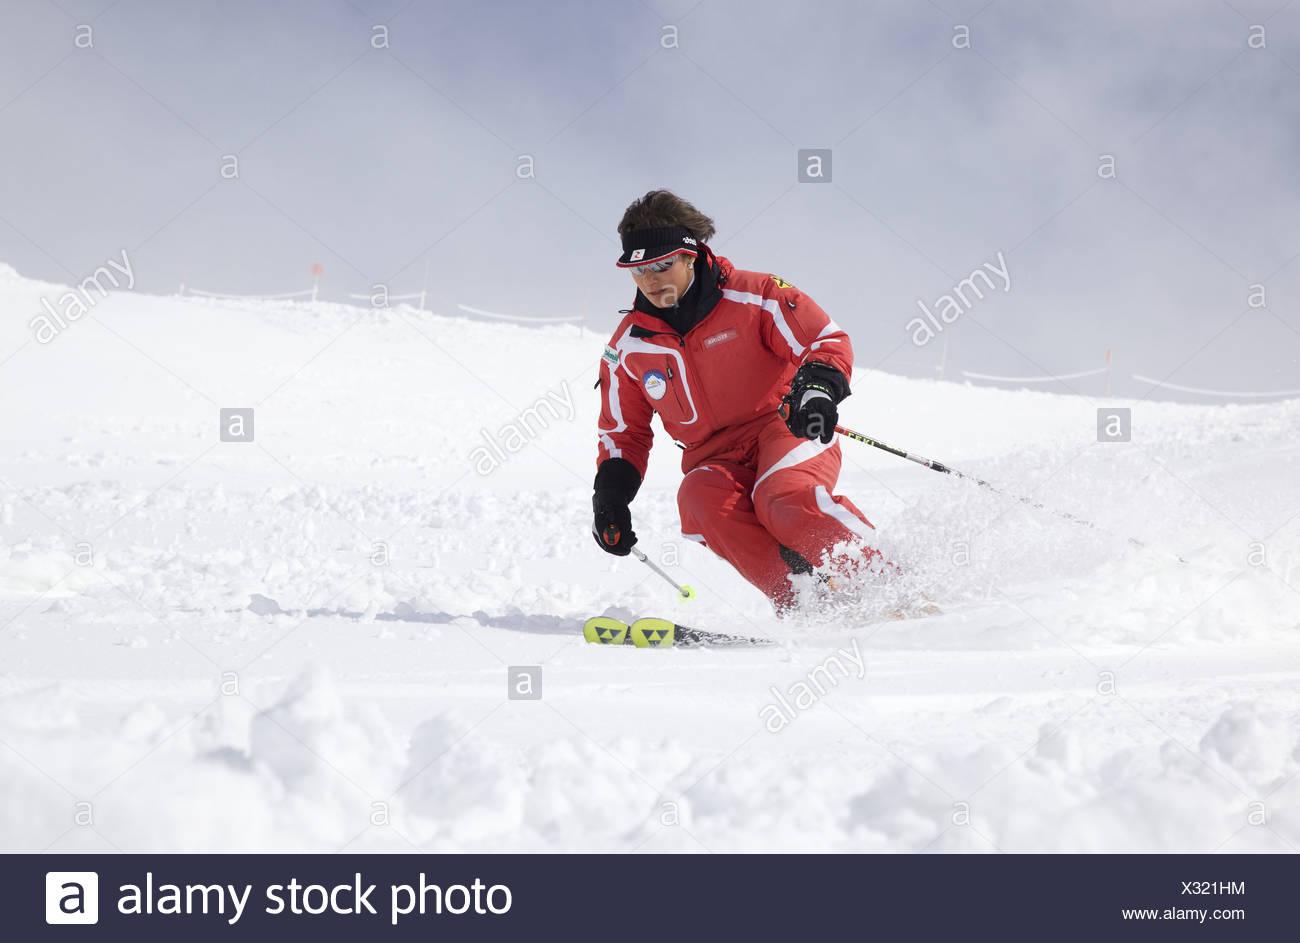 Skiing Stock Photo